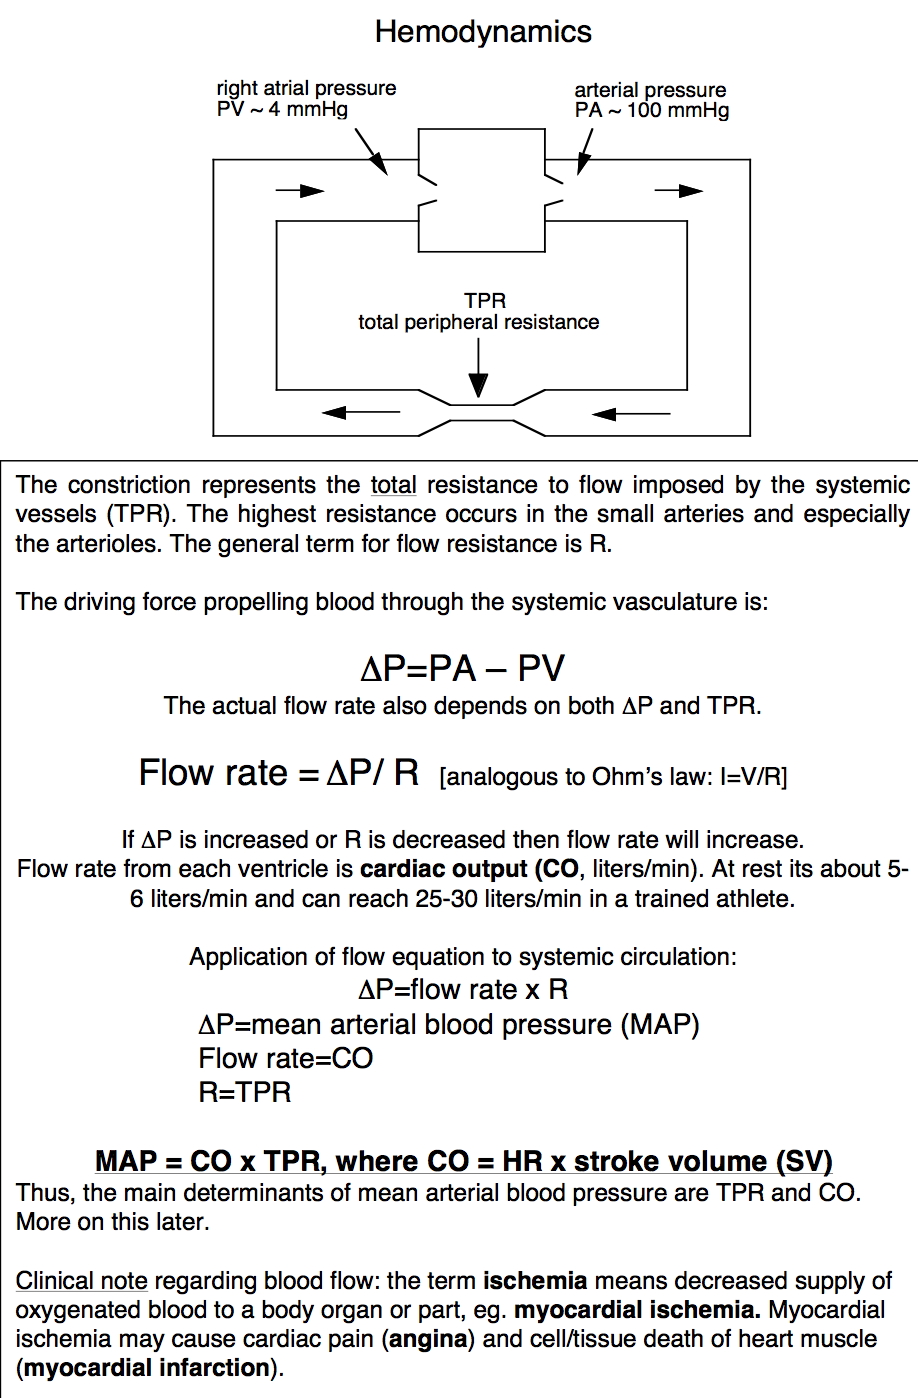 Cardiovascular Physiology Spitzer Lecture 1-3 (Overview of ... on sd map, la map, mn map, ca map, sc map, mc map, ut map, az map, mo map, no map, or map, cu map, pm2.5 map, de map, colorado map, fl map, nc map, ihb map, un map,